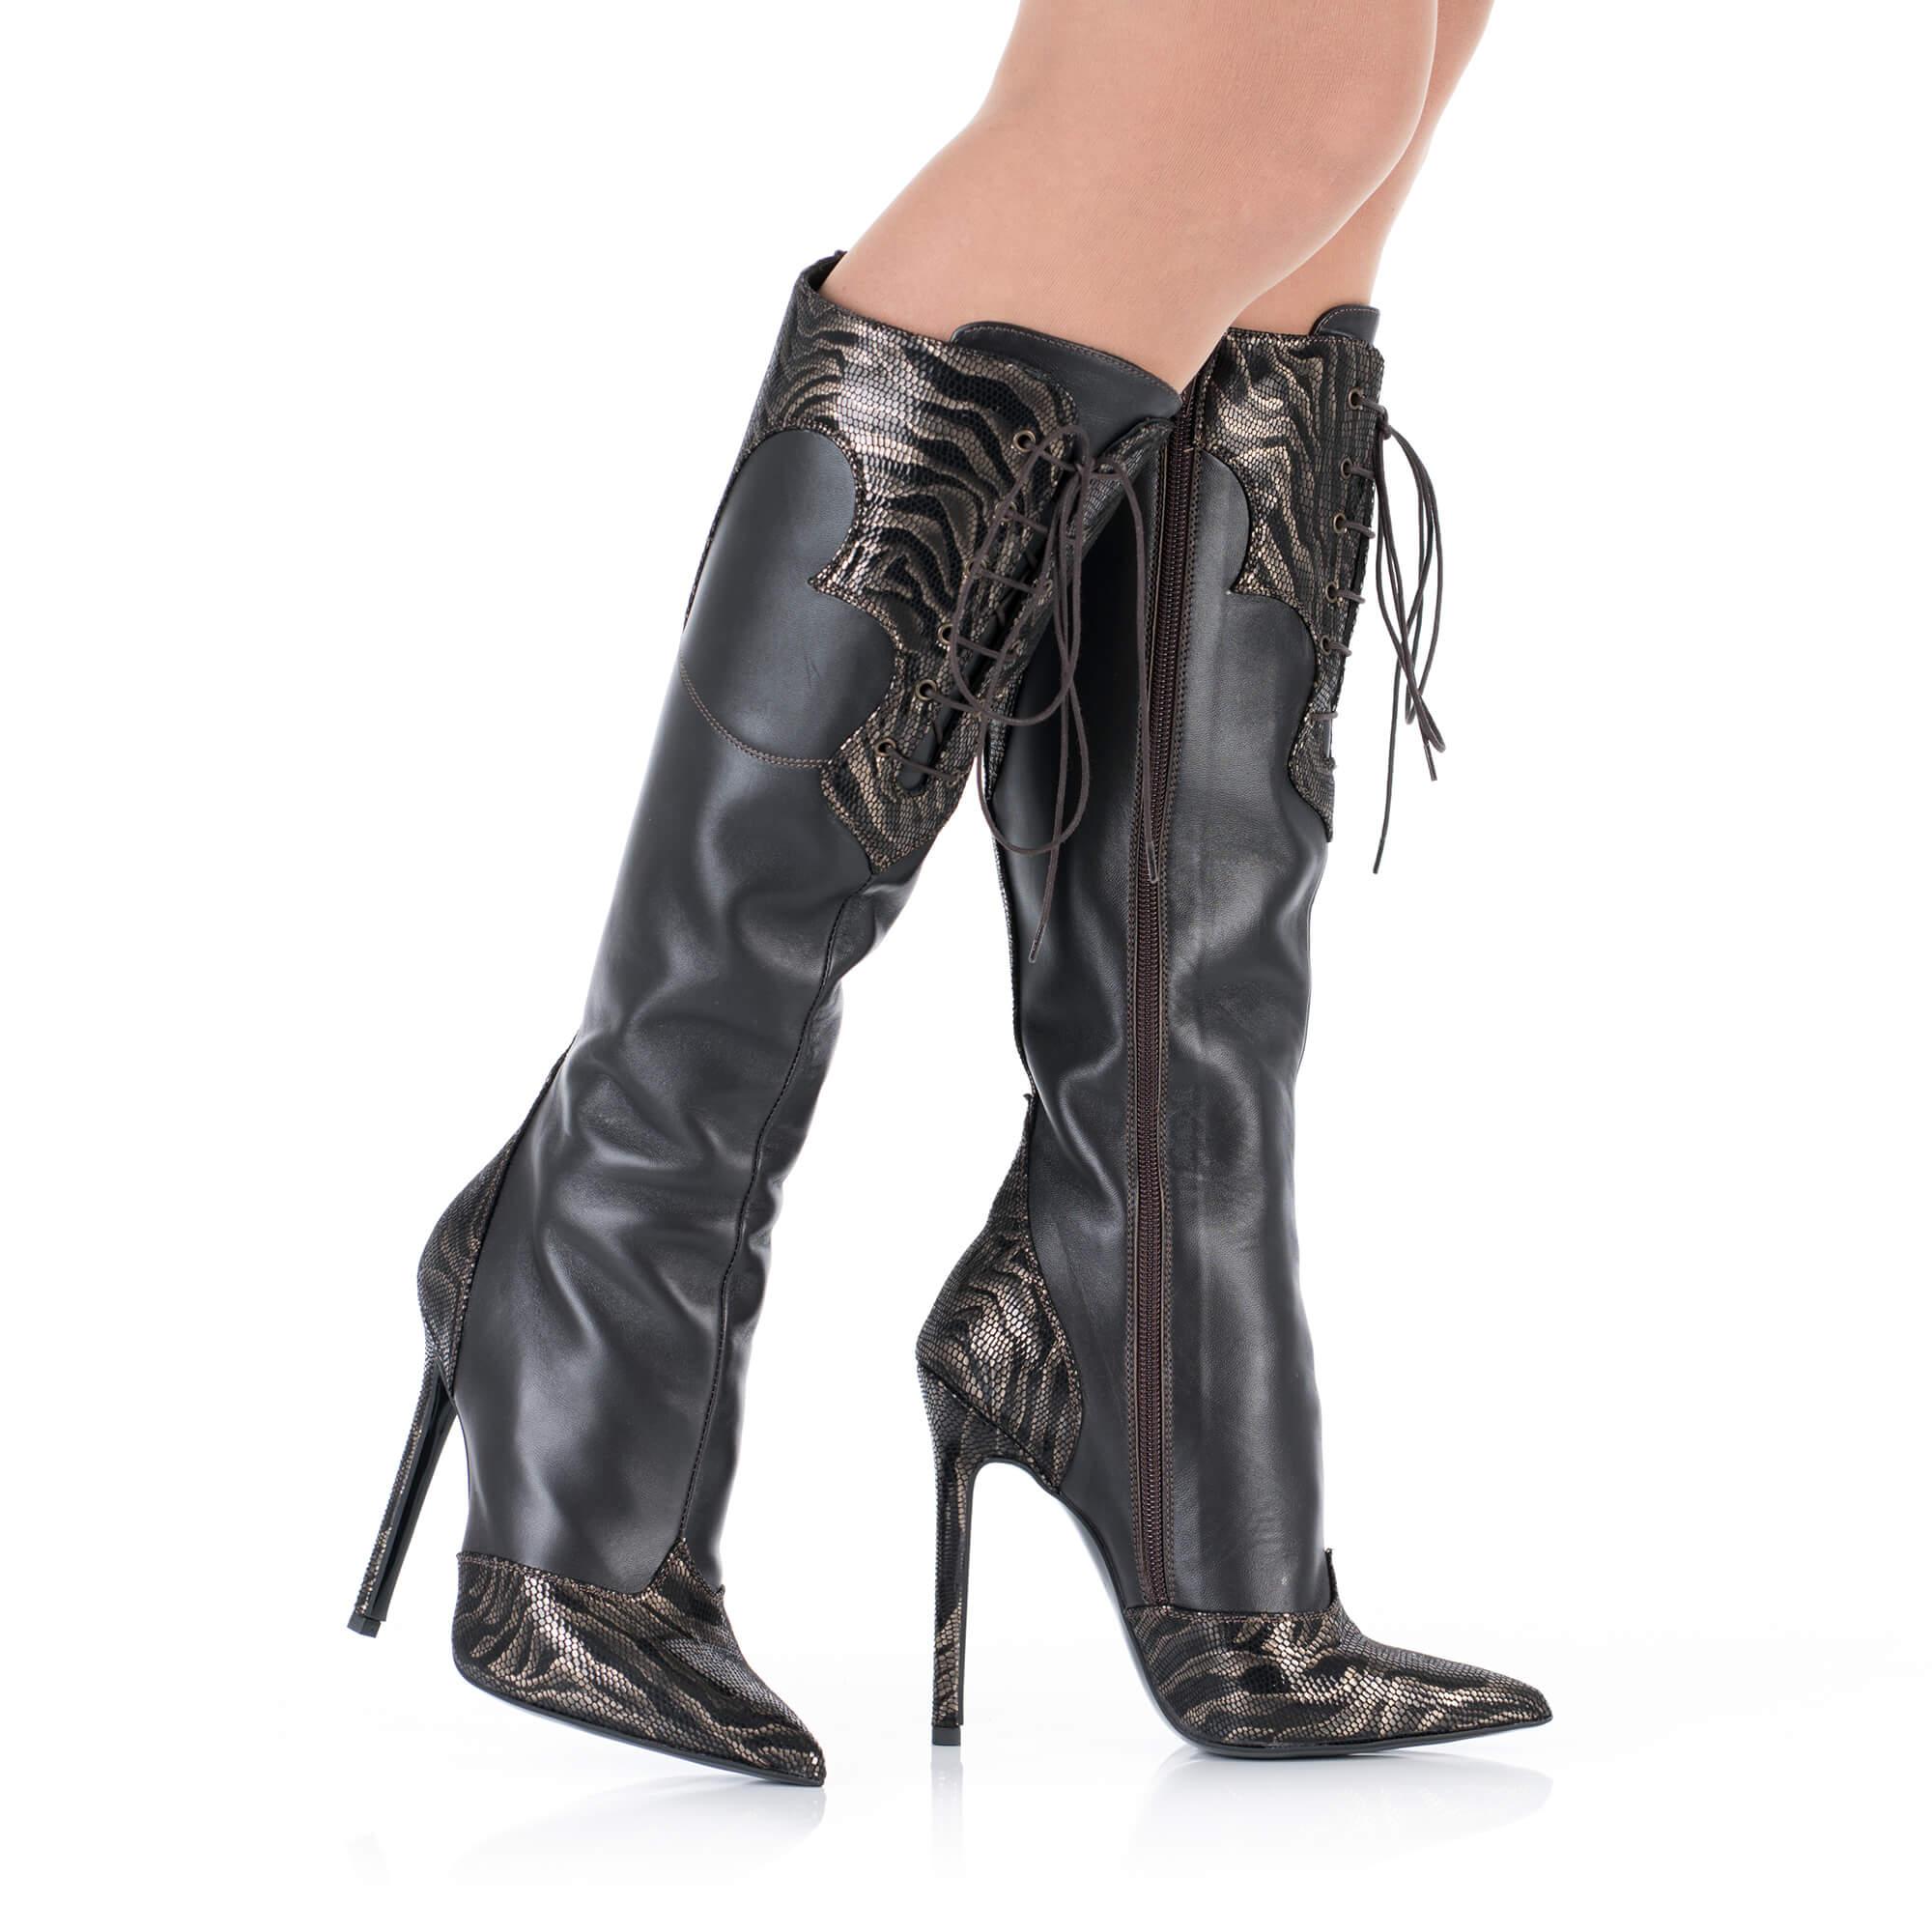 High Heels Lederstiefel Lederstiefel für